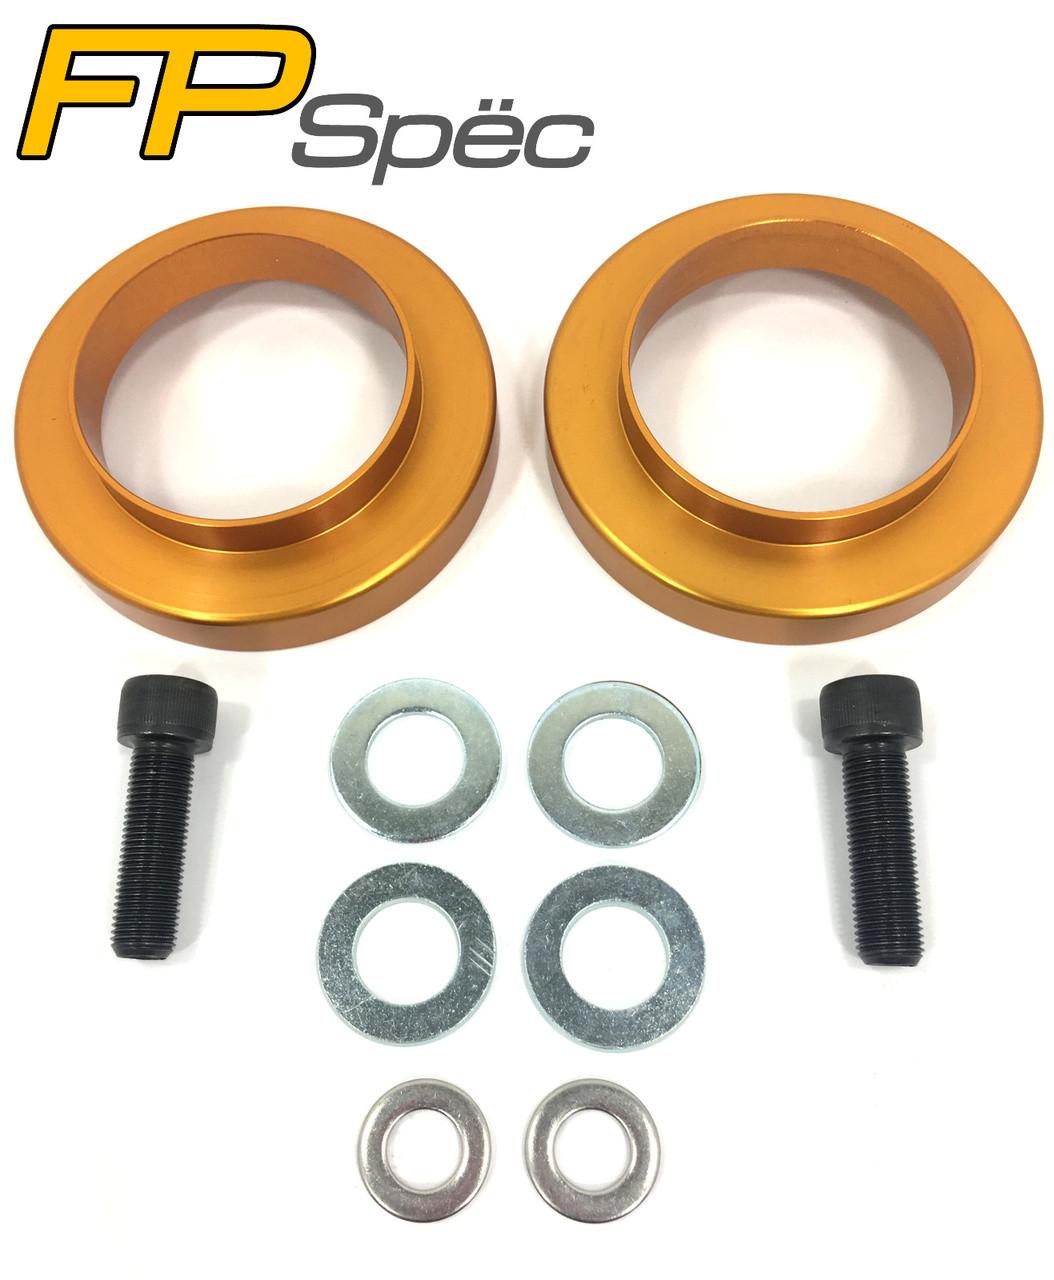 FPSpëc Ohlins DFV 70mm Rear Spring Adapter Kit (NC Miata/RX8